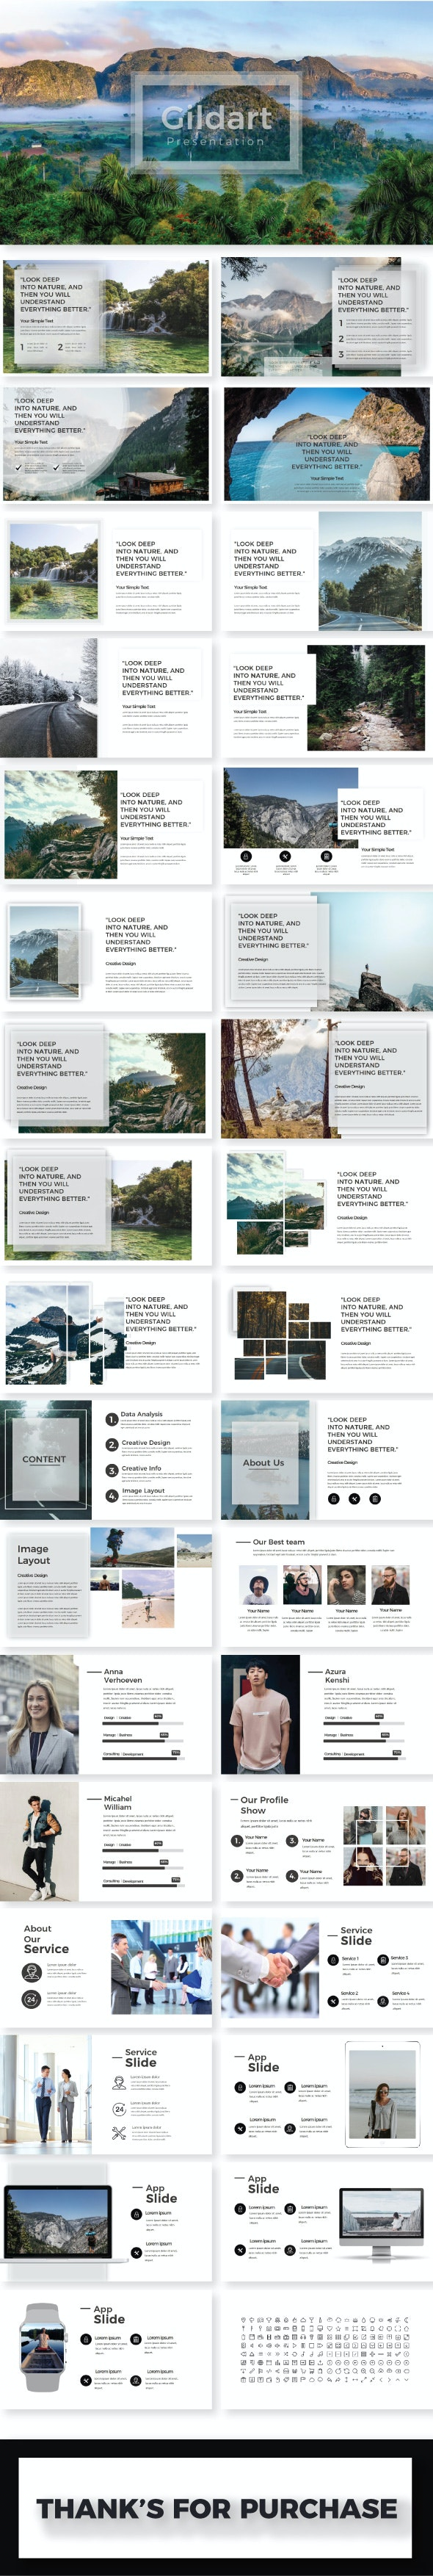 Gildart Keynote Template - Creative Keynote Templates